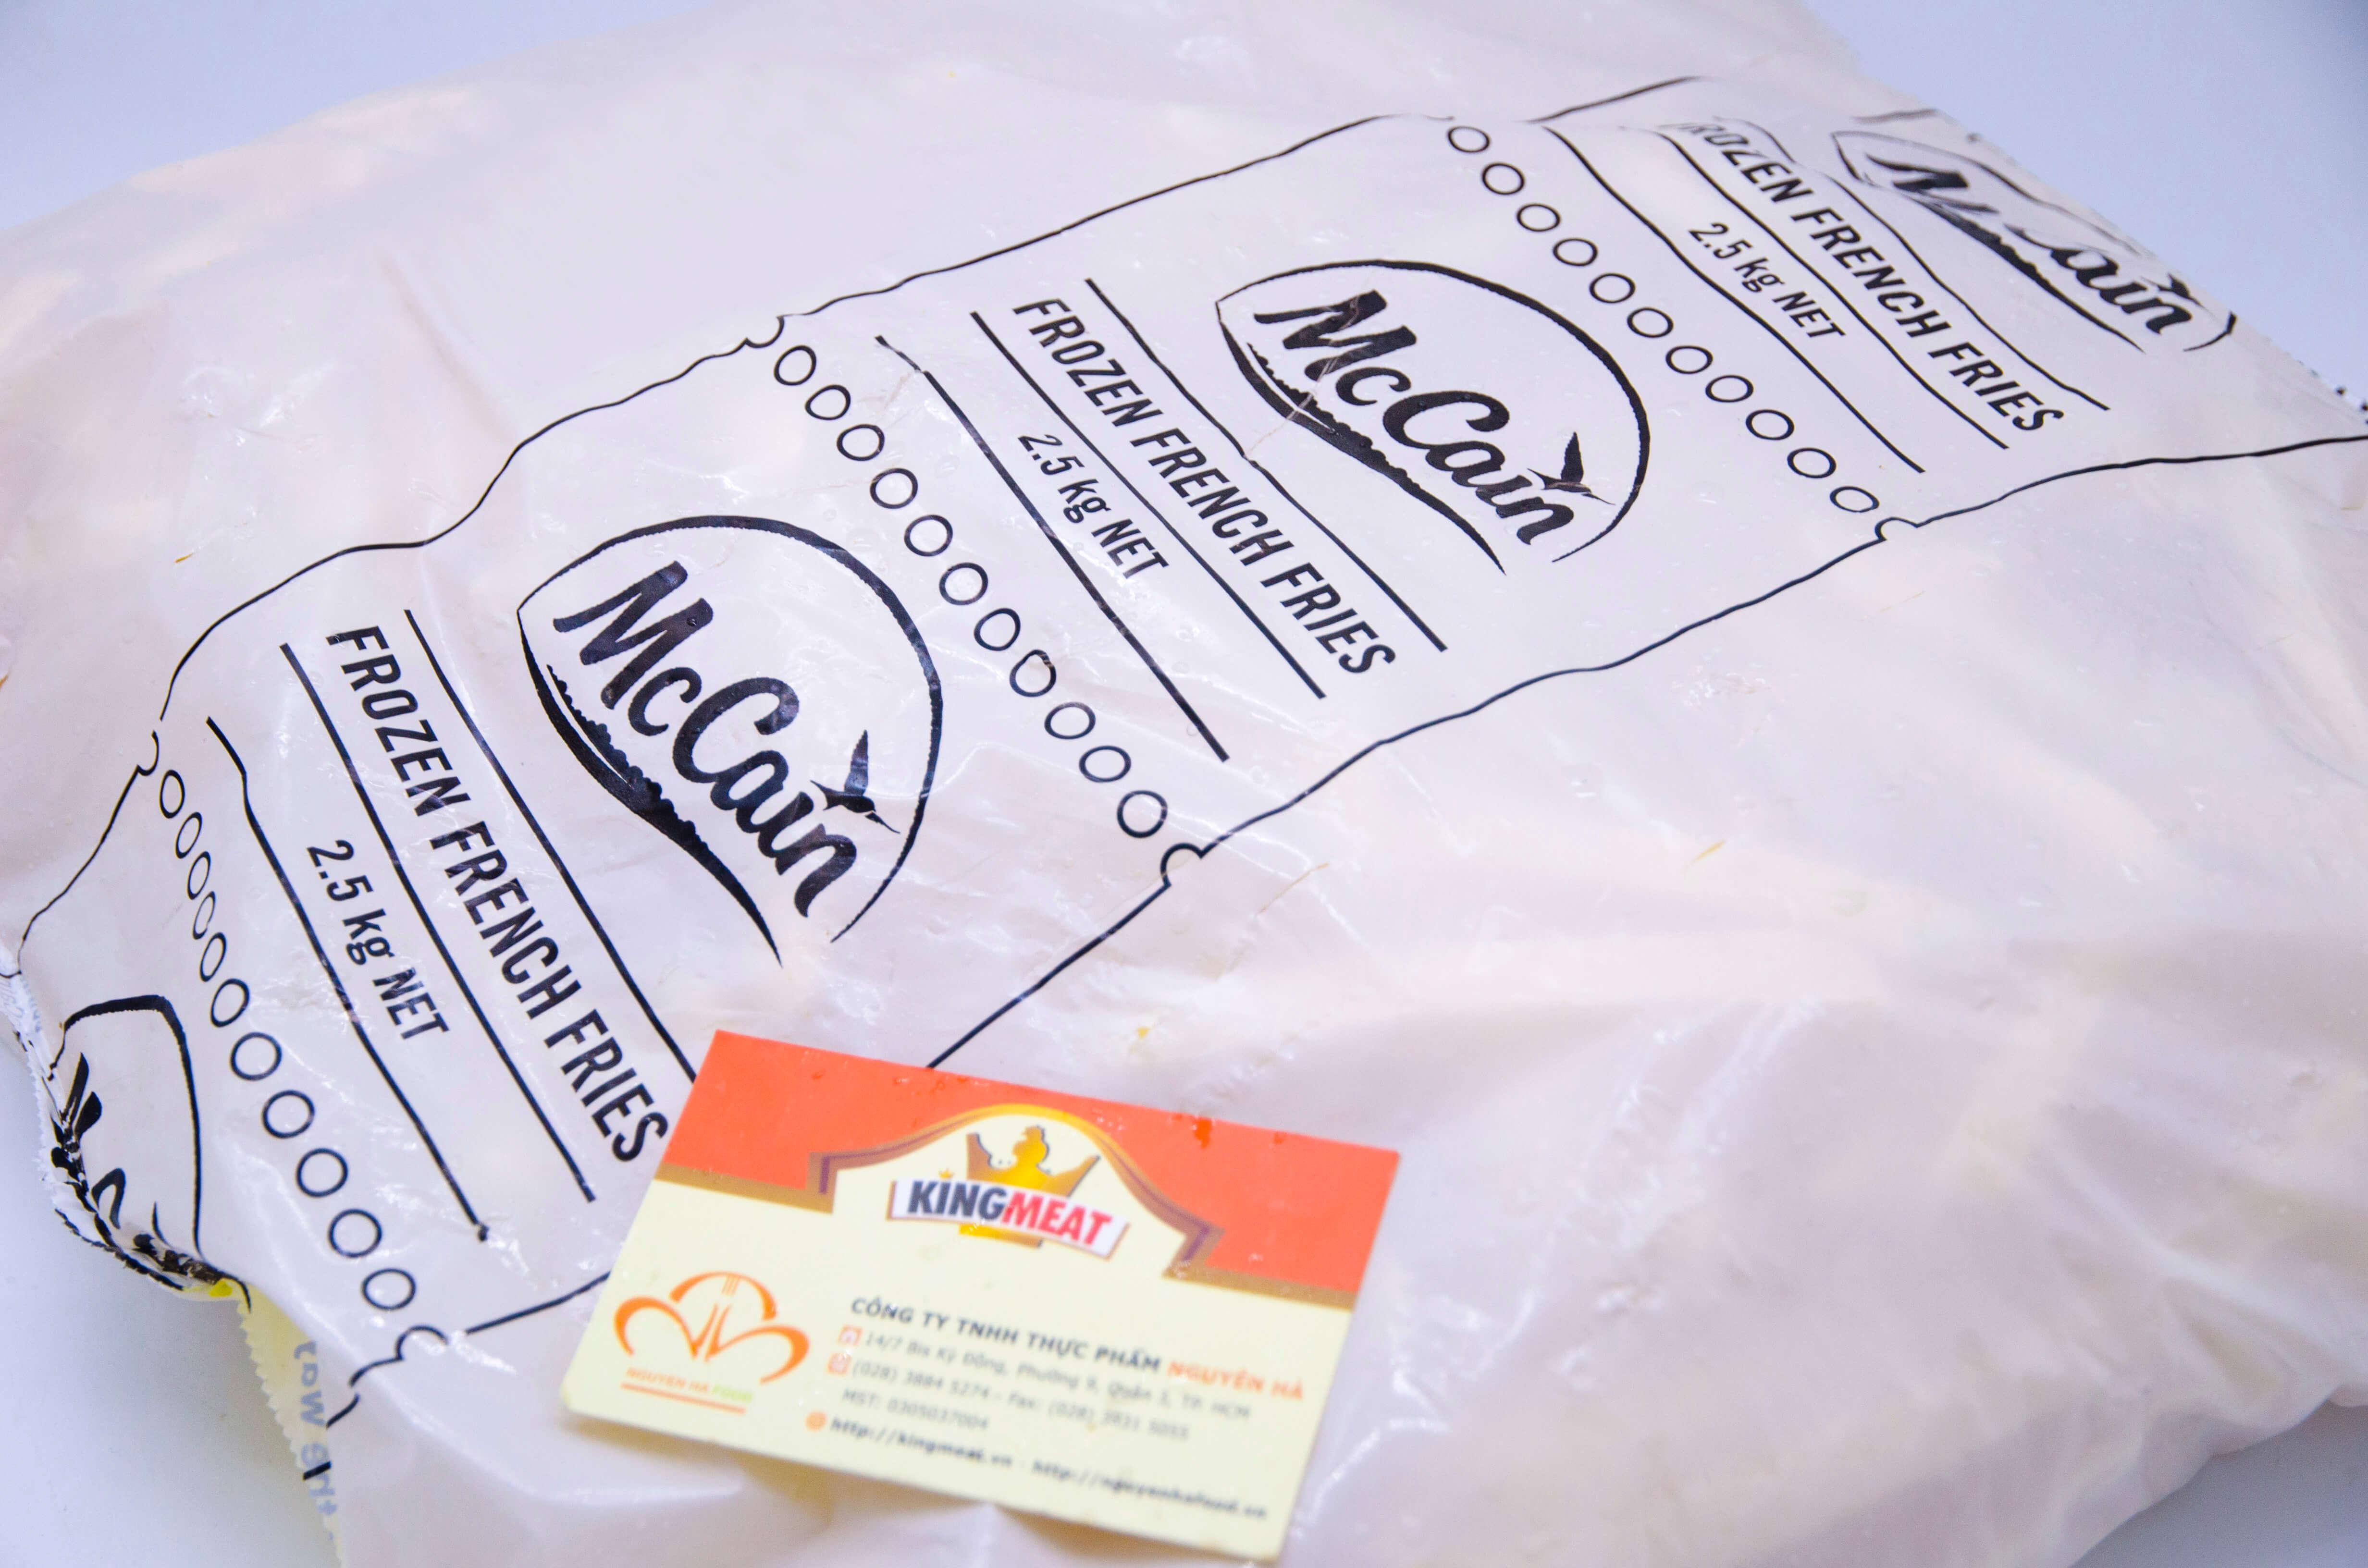 Khoai tây  McCain Cọng lớn  3/8 (~10mm) - McCain Straight Cut Fries 3/8 (~10mm) – 2.5kg/bao